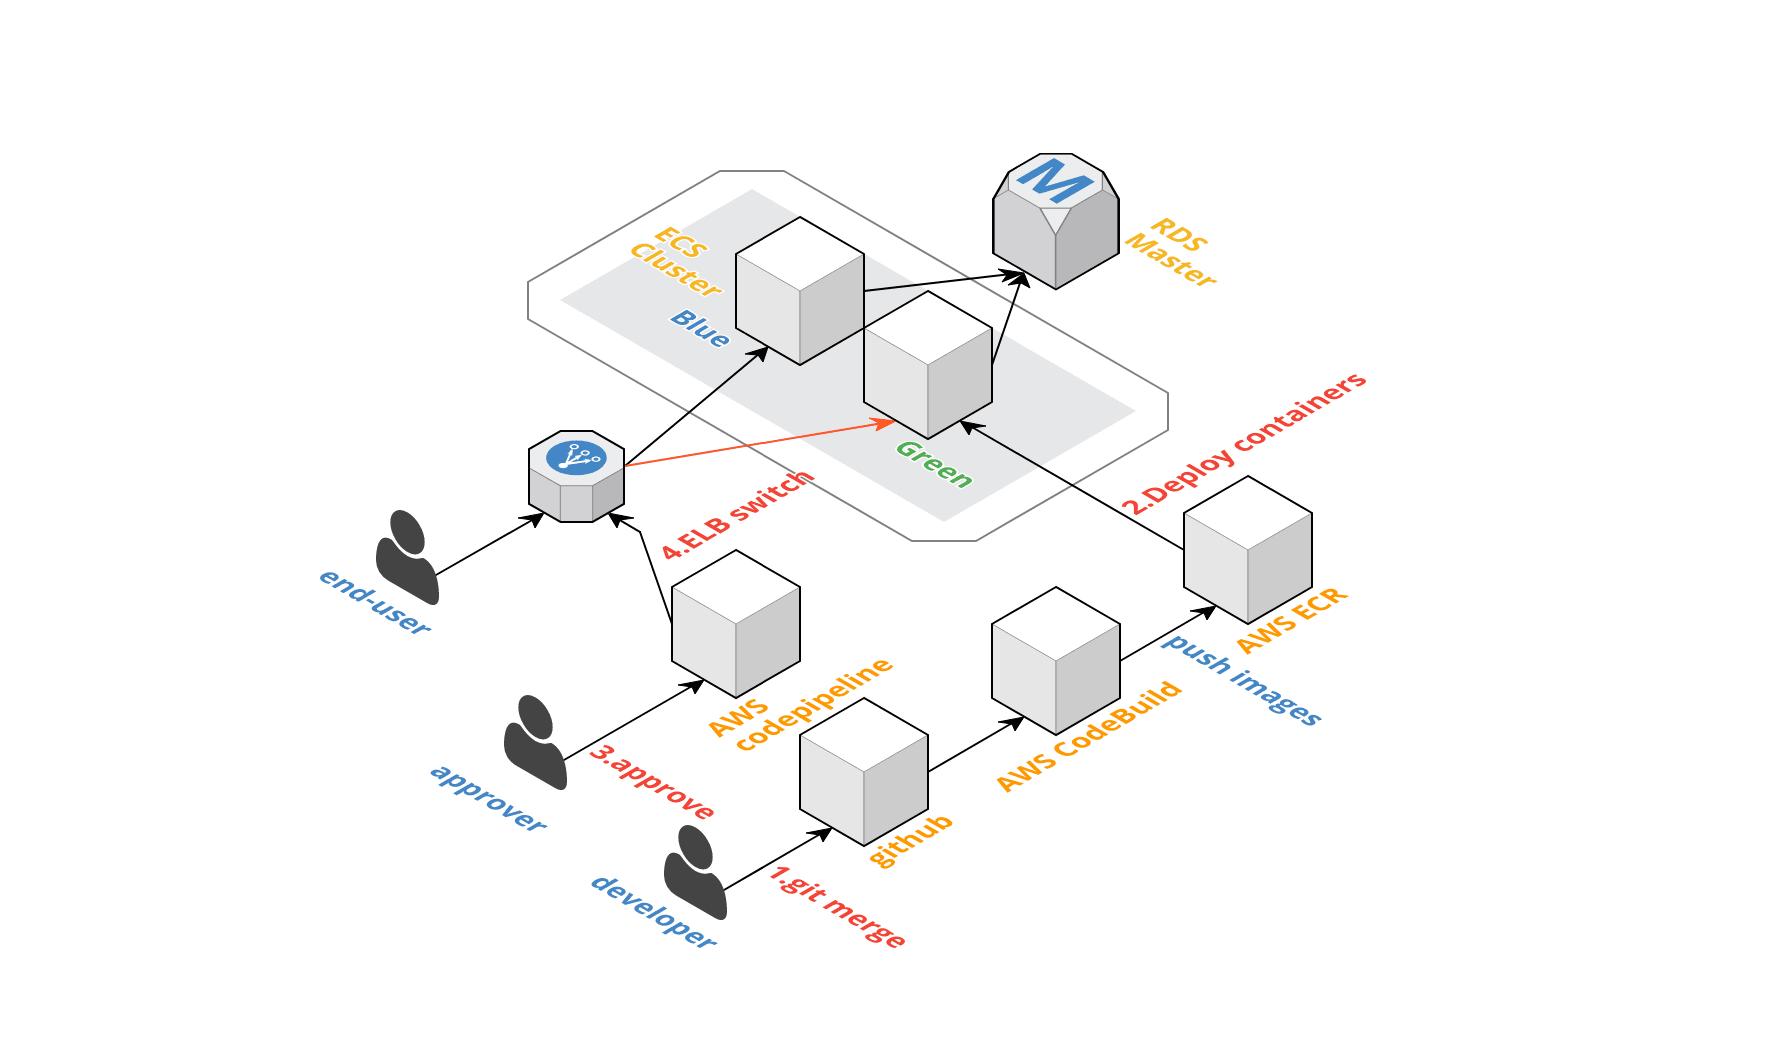 AWS codepipelineで手動承認が複数発生した場合 - Qiita